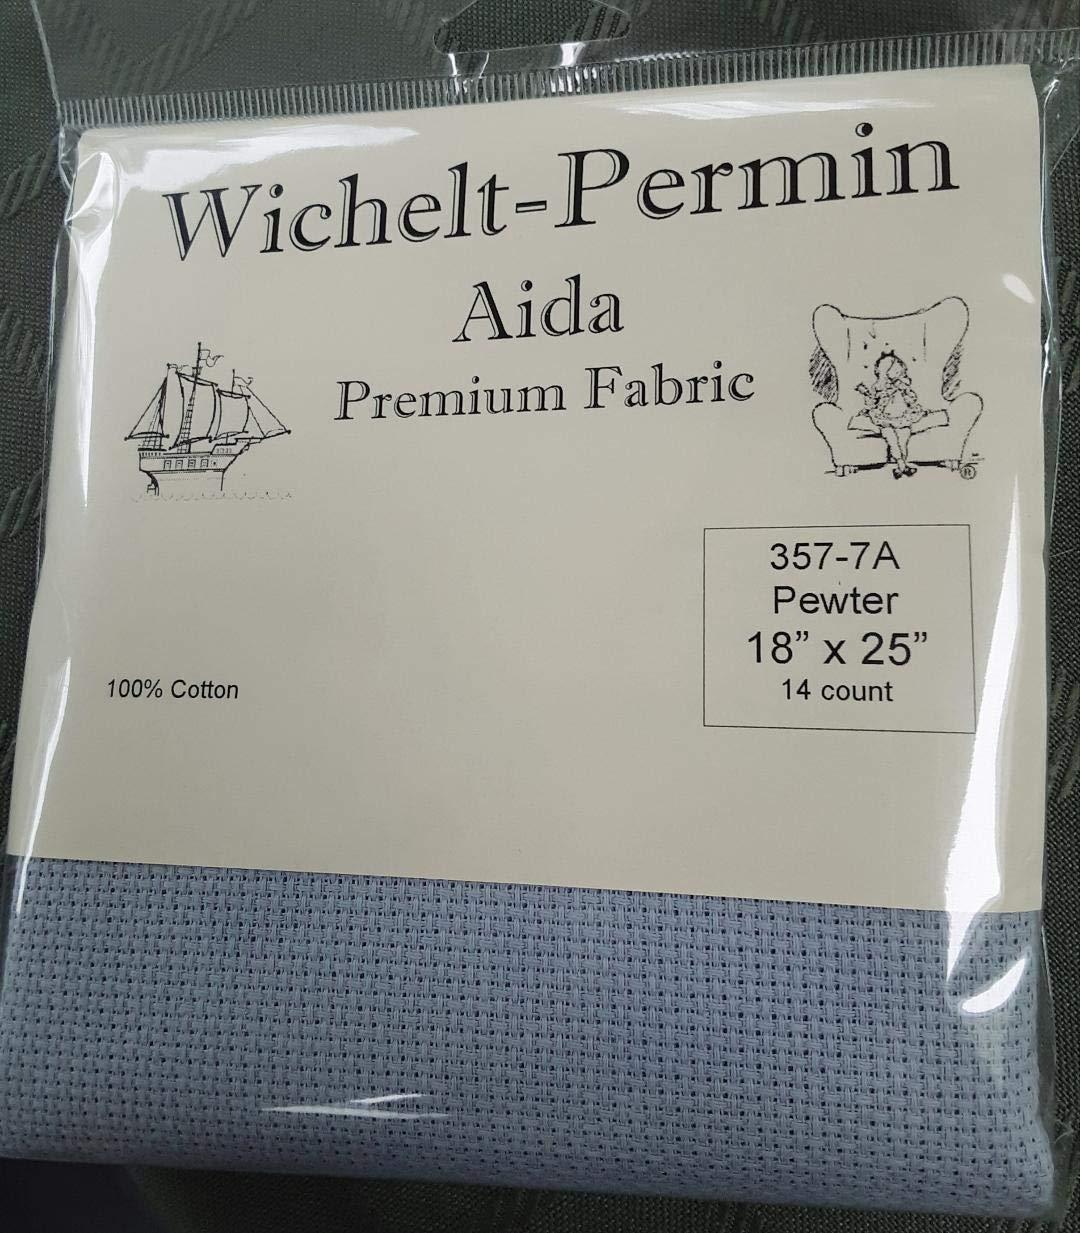 Wichelt Permin Premium AIDA Cross Stitch Fabric 14 Count Pewter 18 x 25